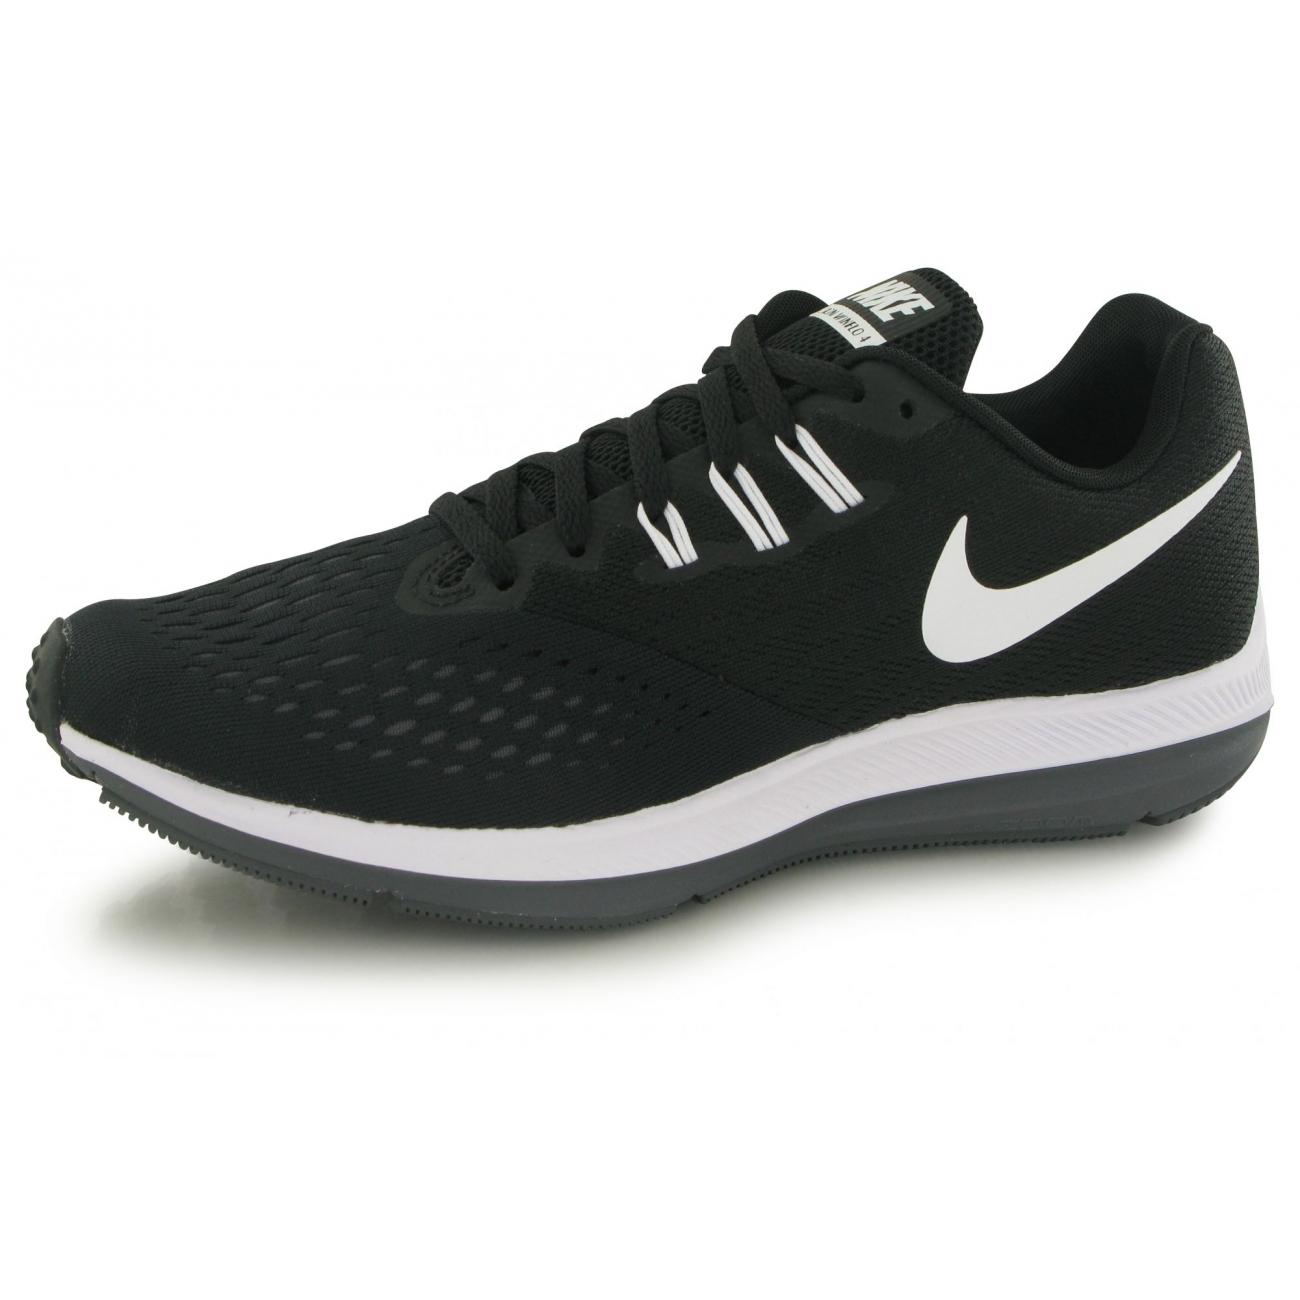 Running Chaussure Chaussures Go Sport Lescahiersdalter De Homme vwN8m0On